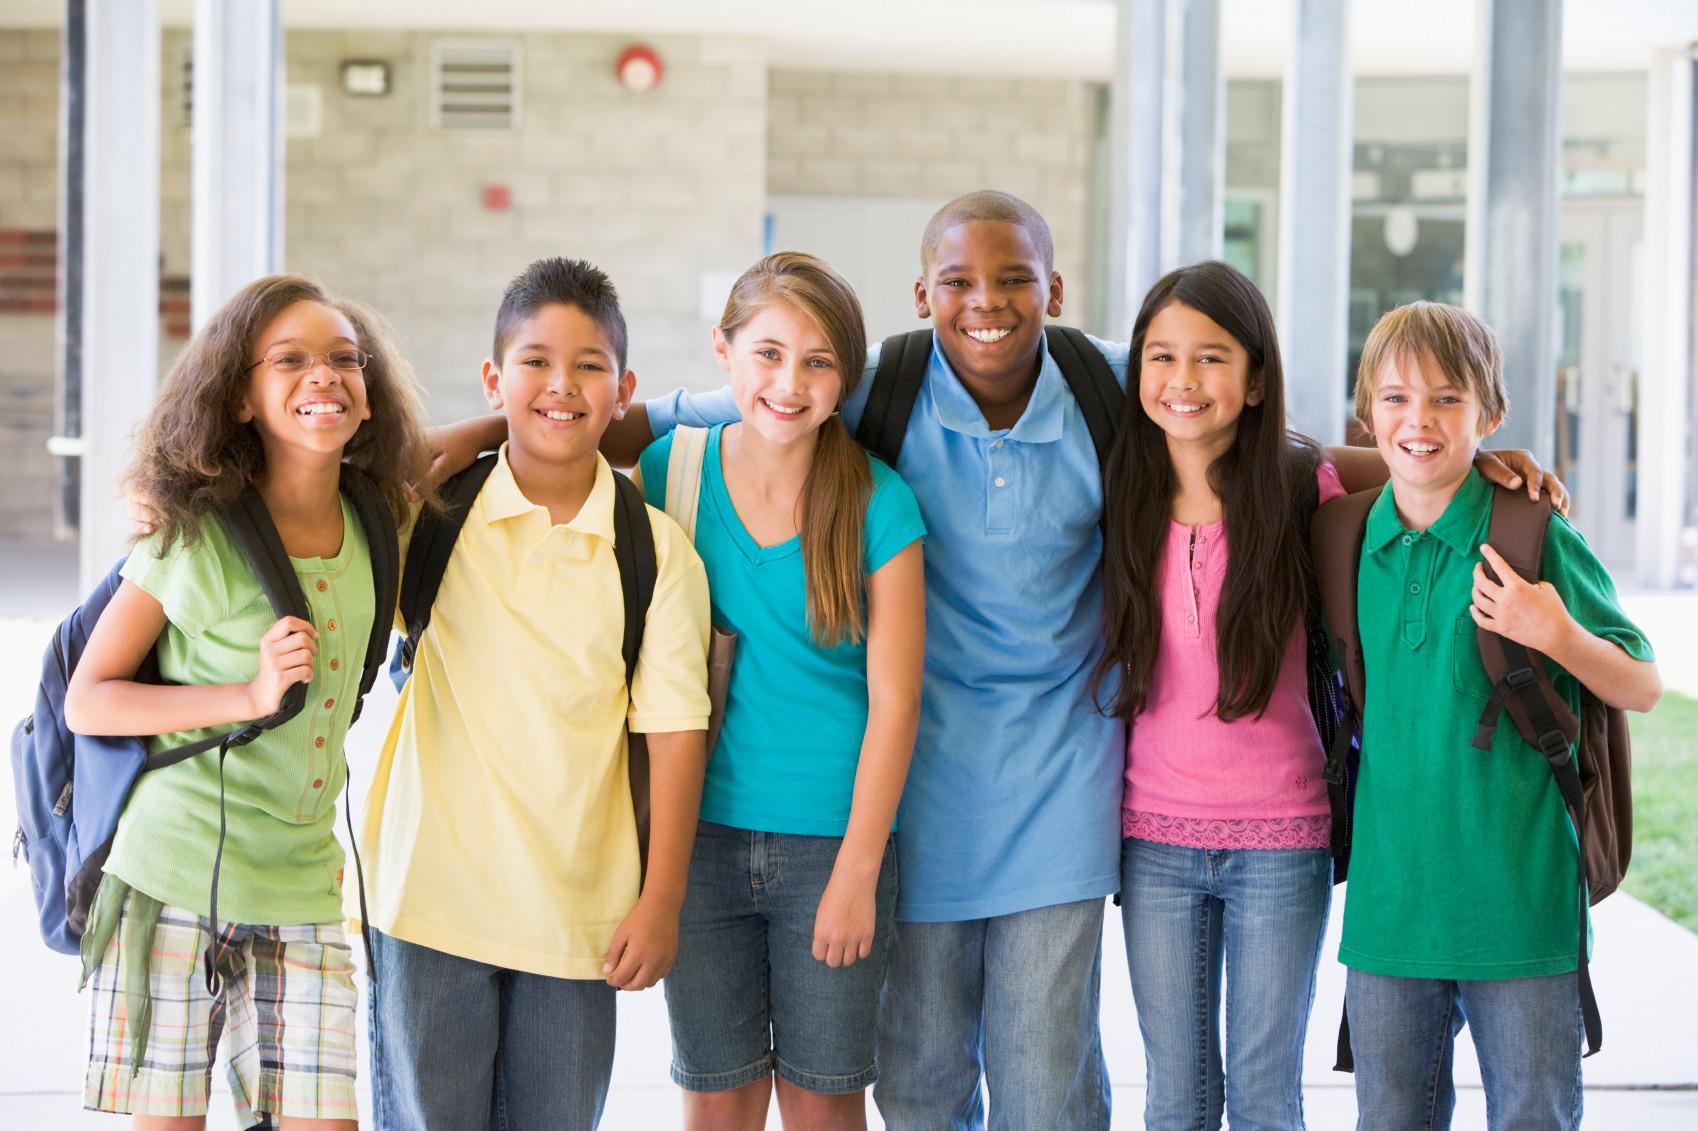 kids-at-school-cd0a03ac05256e7d14d1e464af4f8f2417e0959ff12040996689f02d8b8307ff.jpg